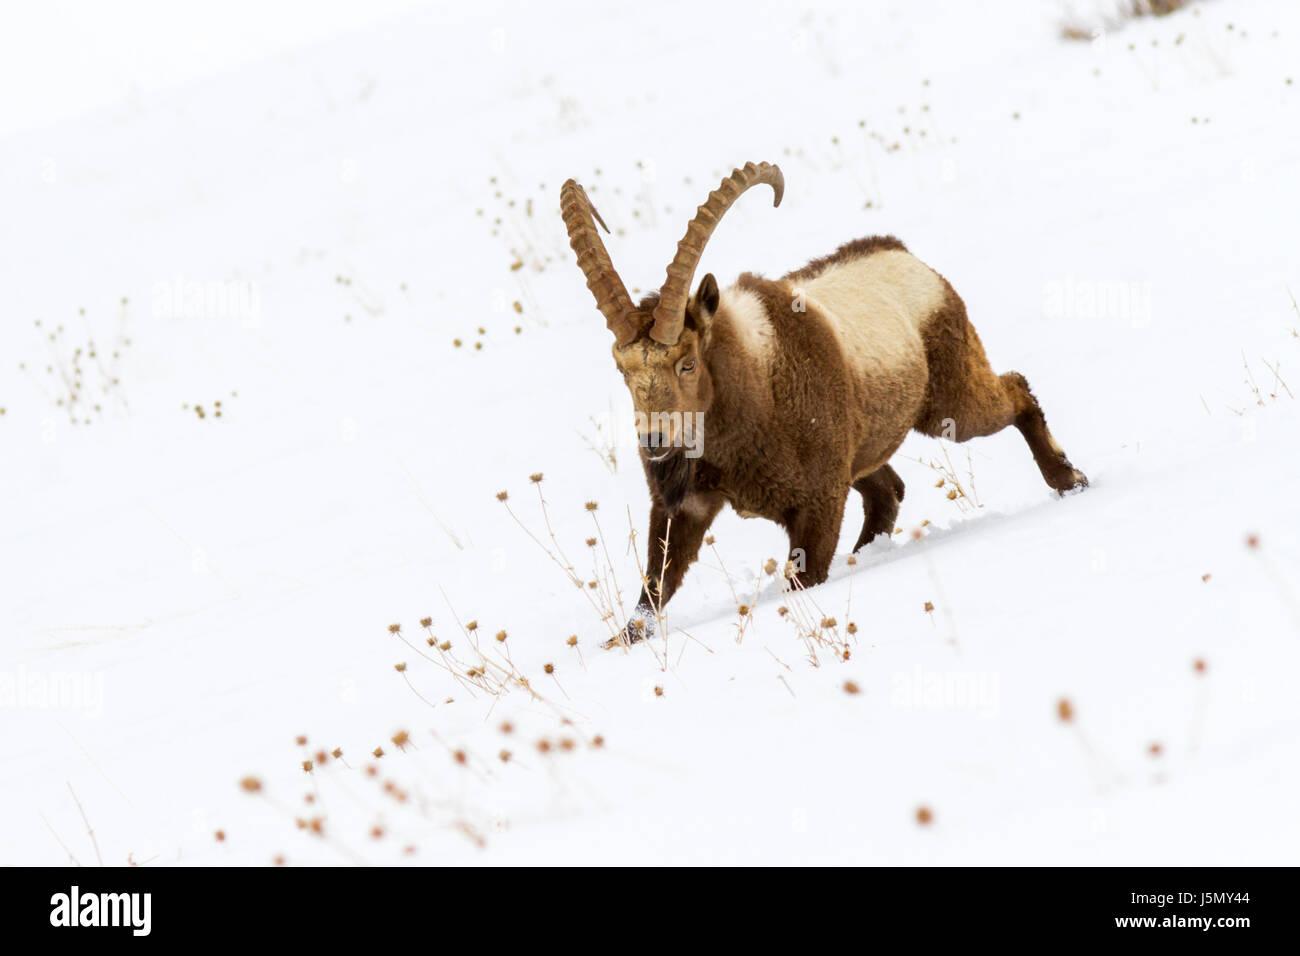 Himalayan Ibex (Capra sibirica hemalayanus) in high altitude mountains of Himalayas in Spiti Valley near Kibber - Stock Image